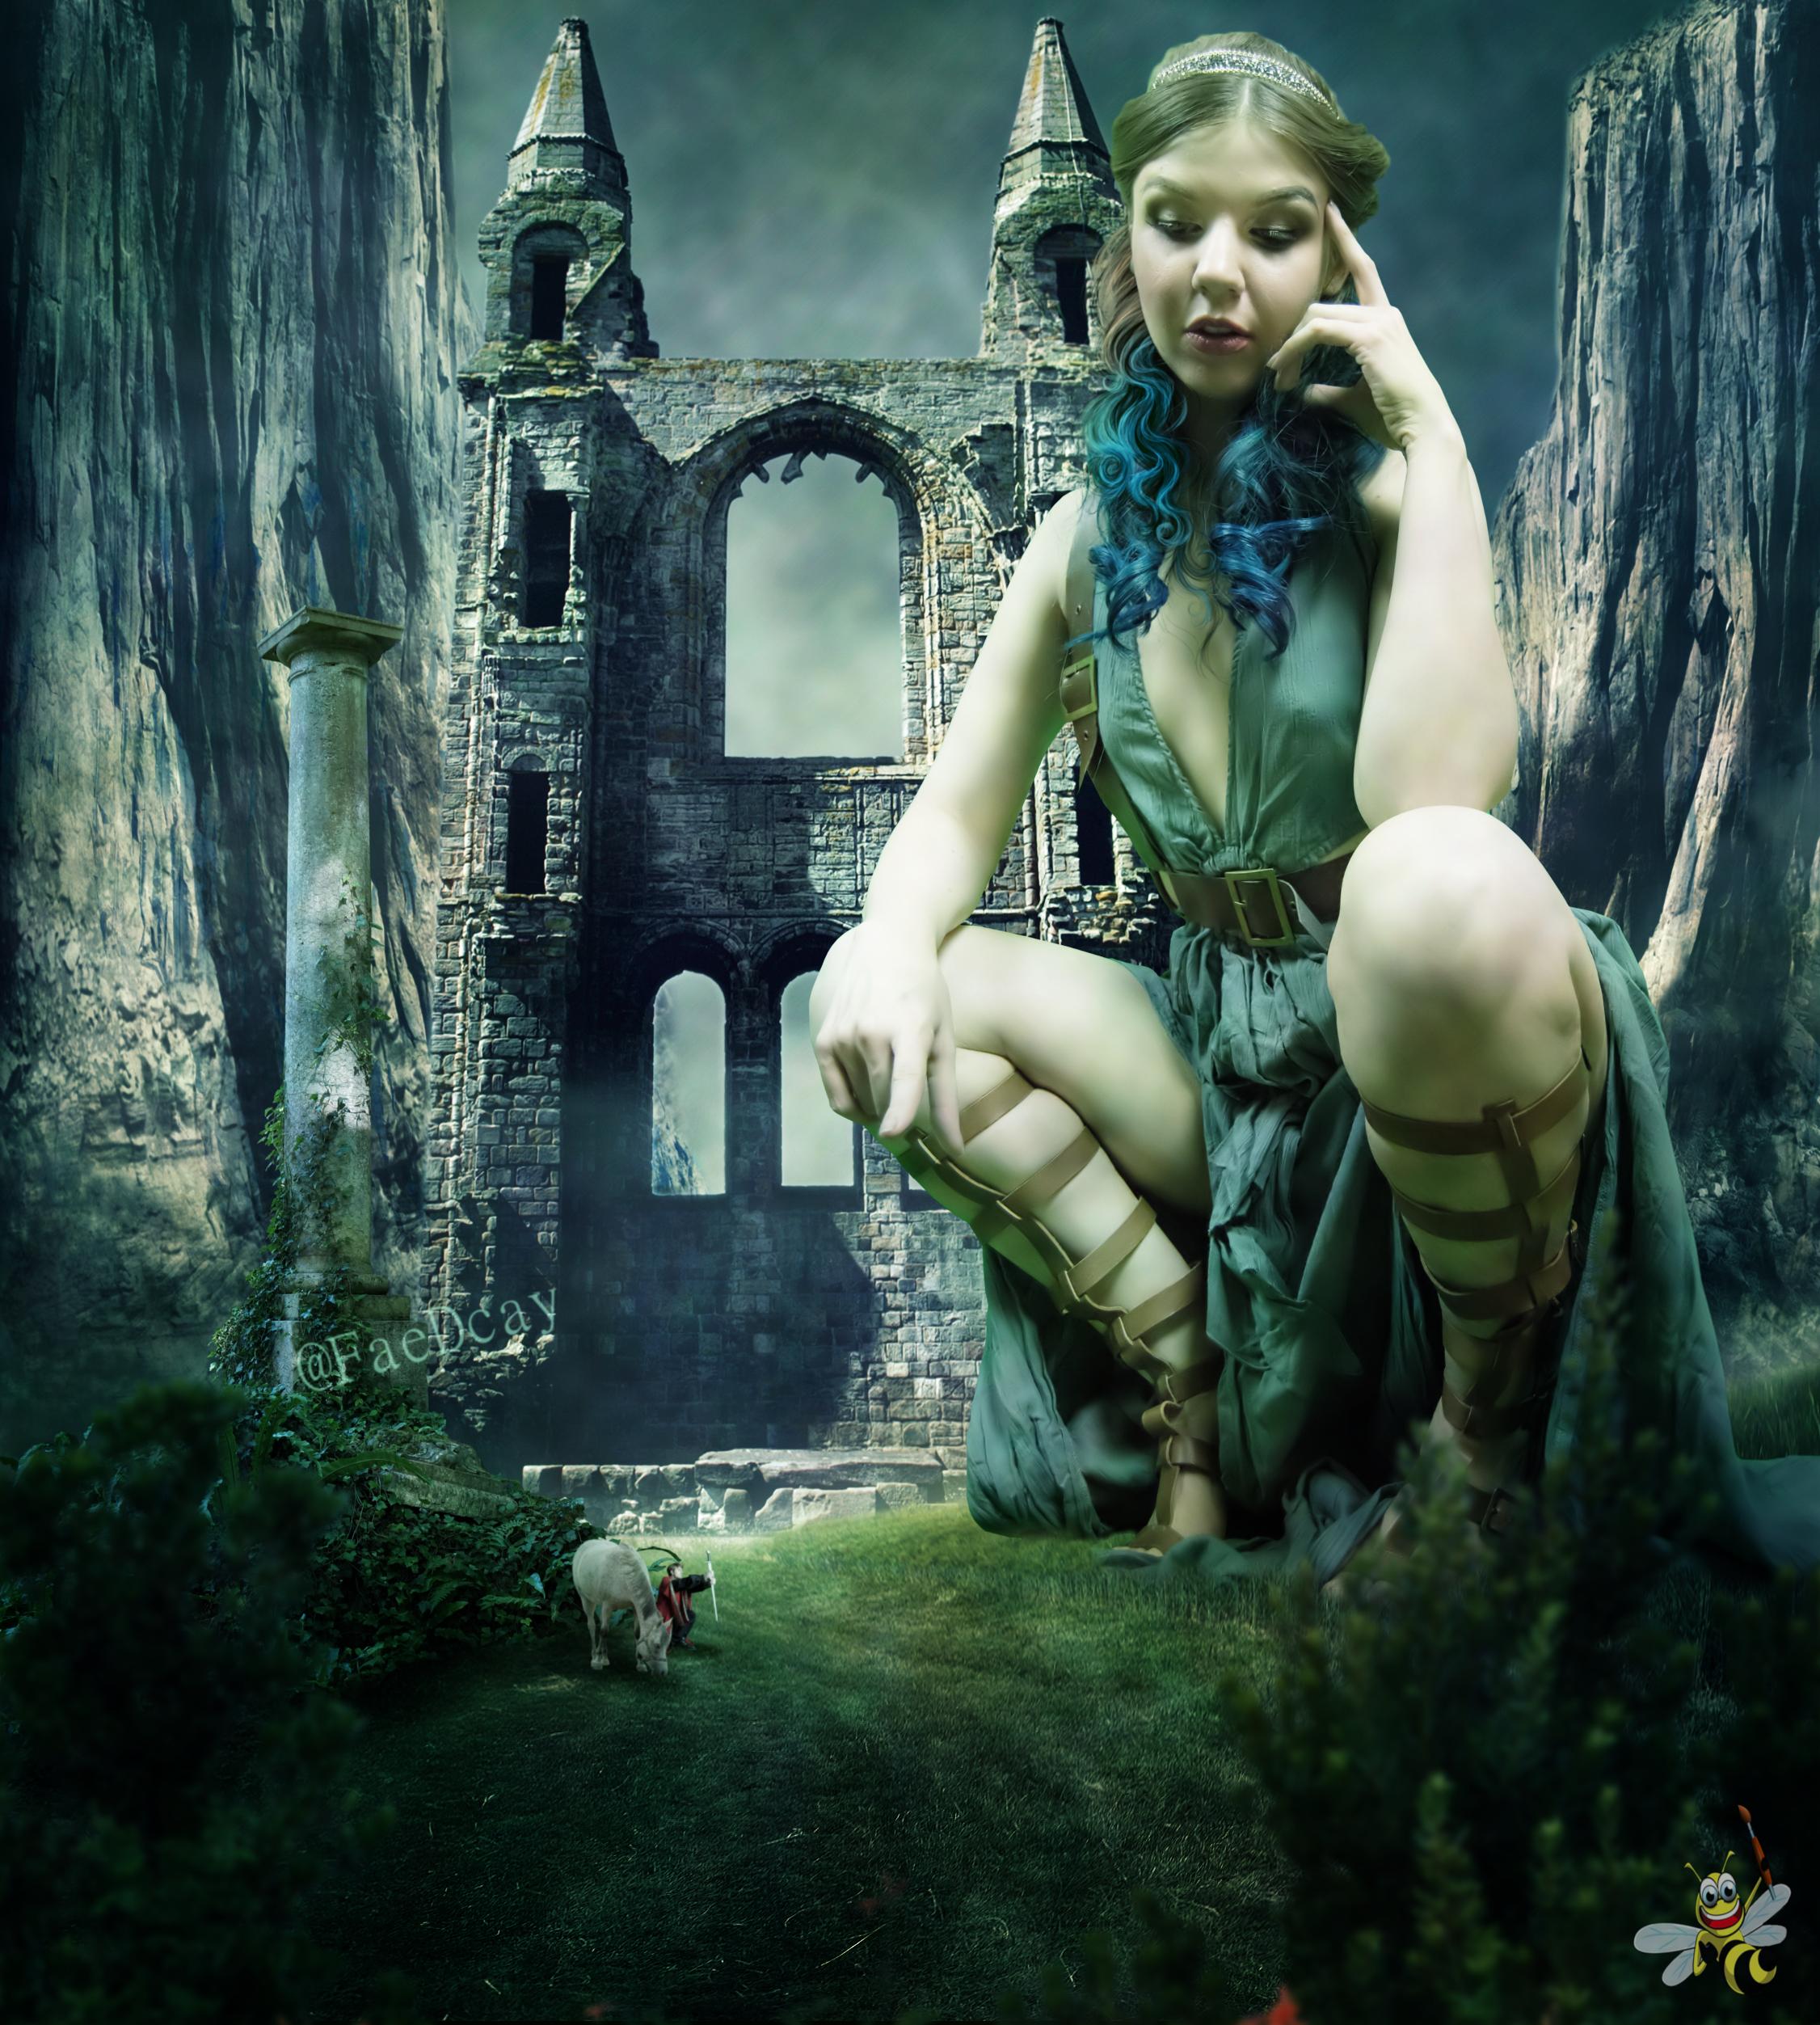 Goddess (Fae Dcay) by LittleBee8705